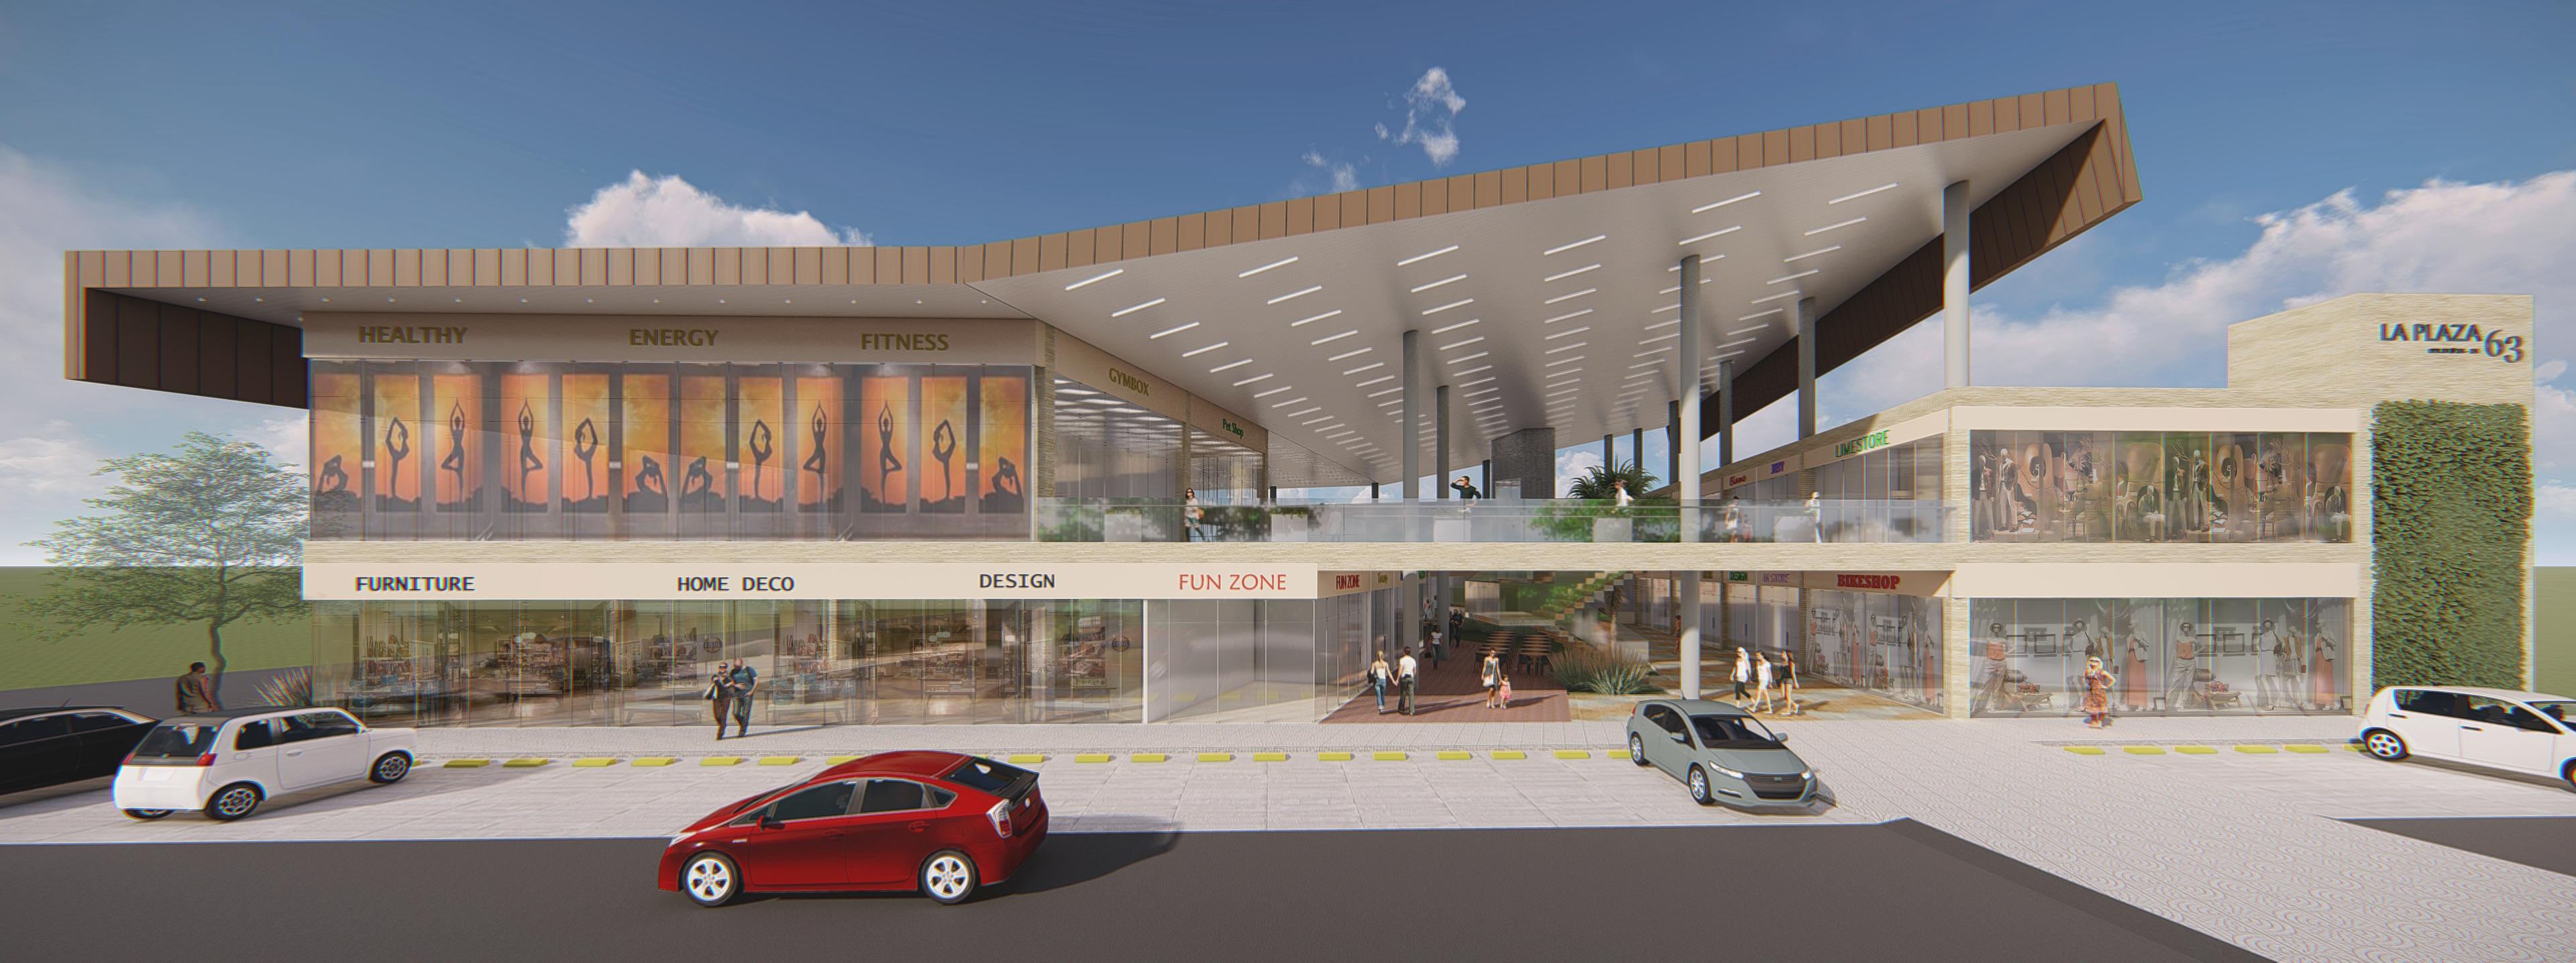 Street Mall Plaza 63